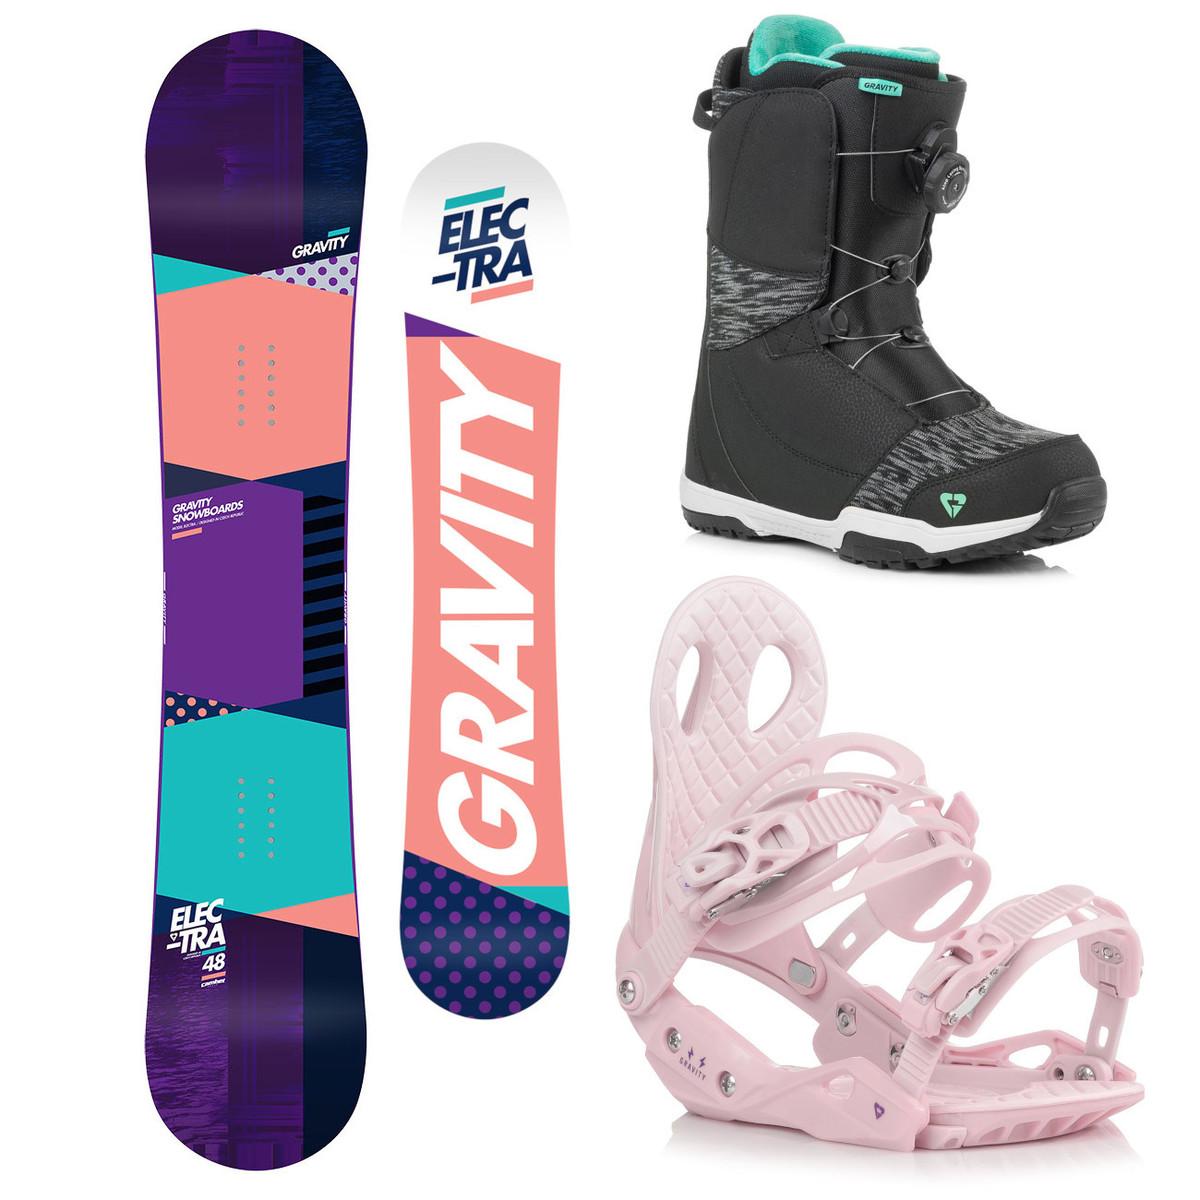 Snowboardový komplet Gravity Electra 18/19 M (EU 37-42) 148 Růžová